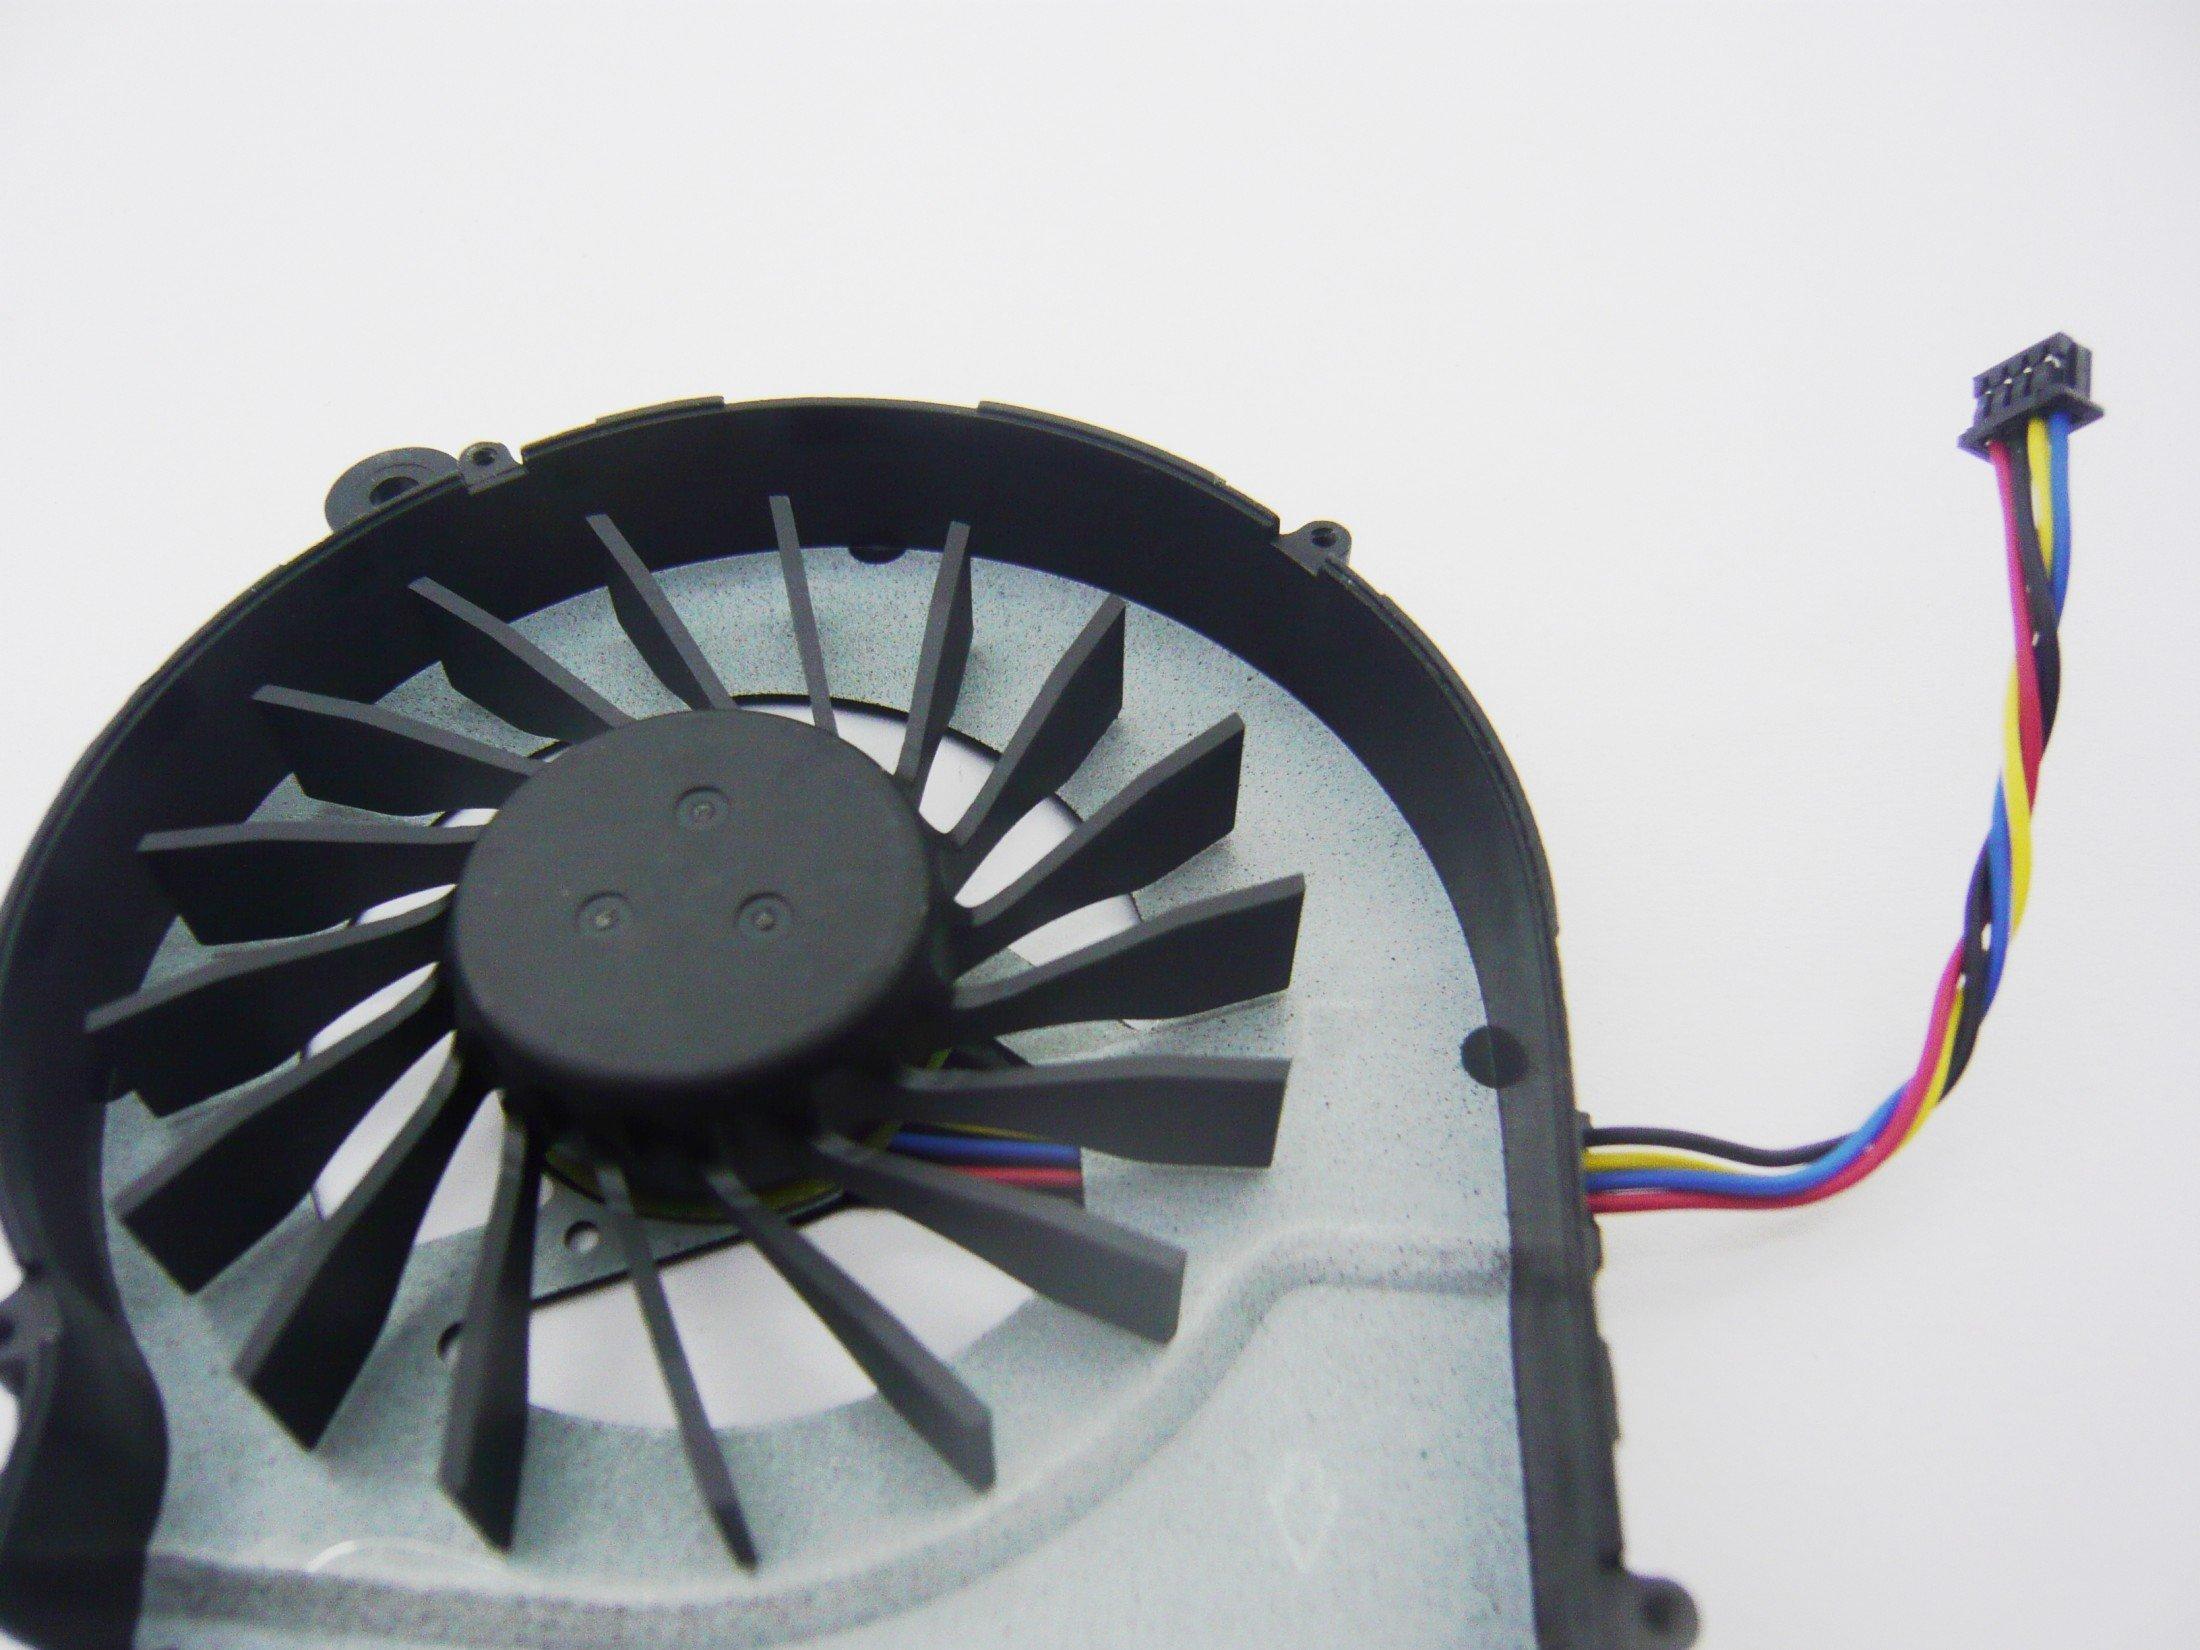 Generic CPU Fan For HP Pavilion g6-1d66nr g6-1d65ca g6-1d70us Notebook PC